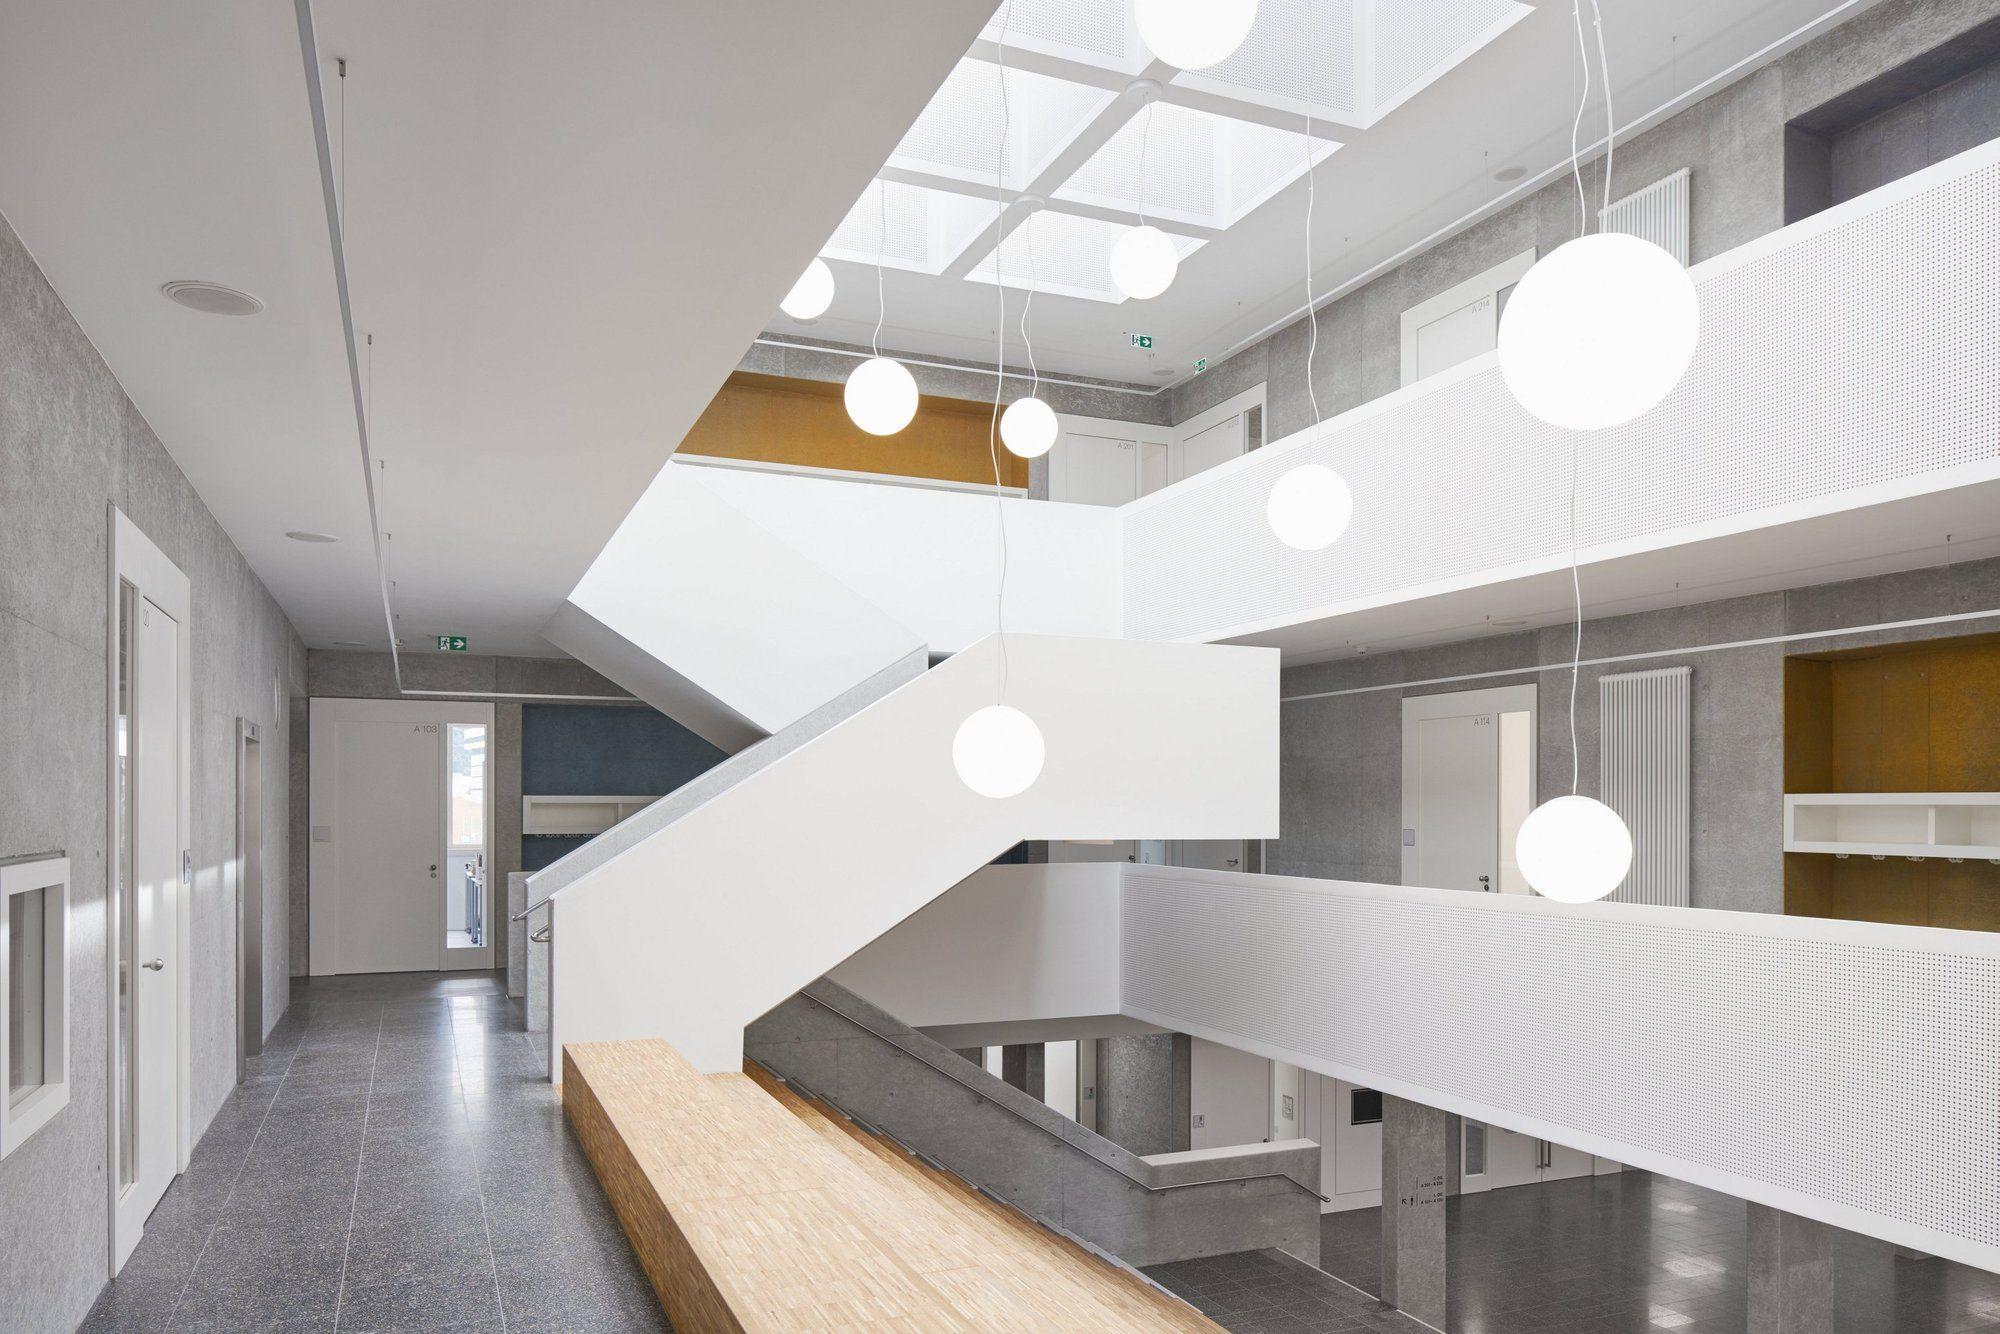 Gallery of School and Community Center u201cB